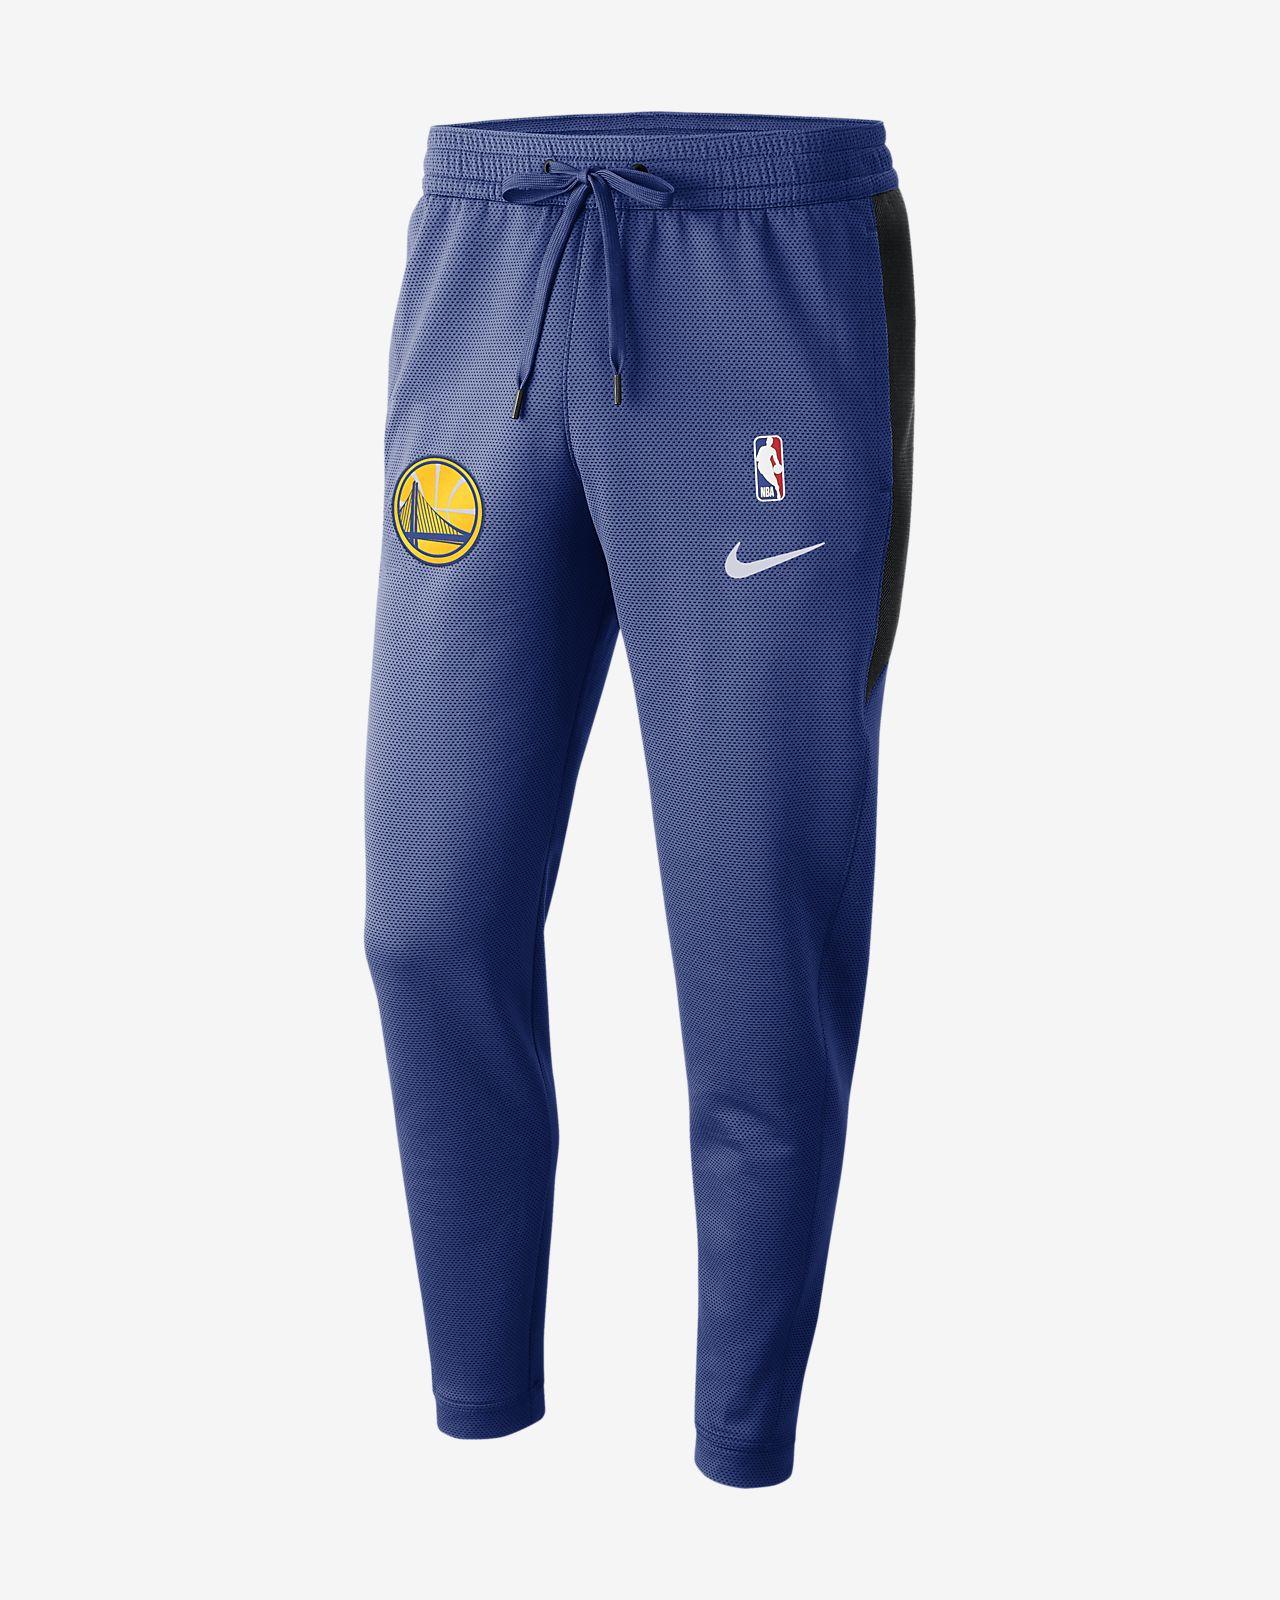 Golden State Warriors Nike Therma Flex Showtime Pantalón de la NBA - Hombre